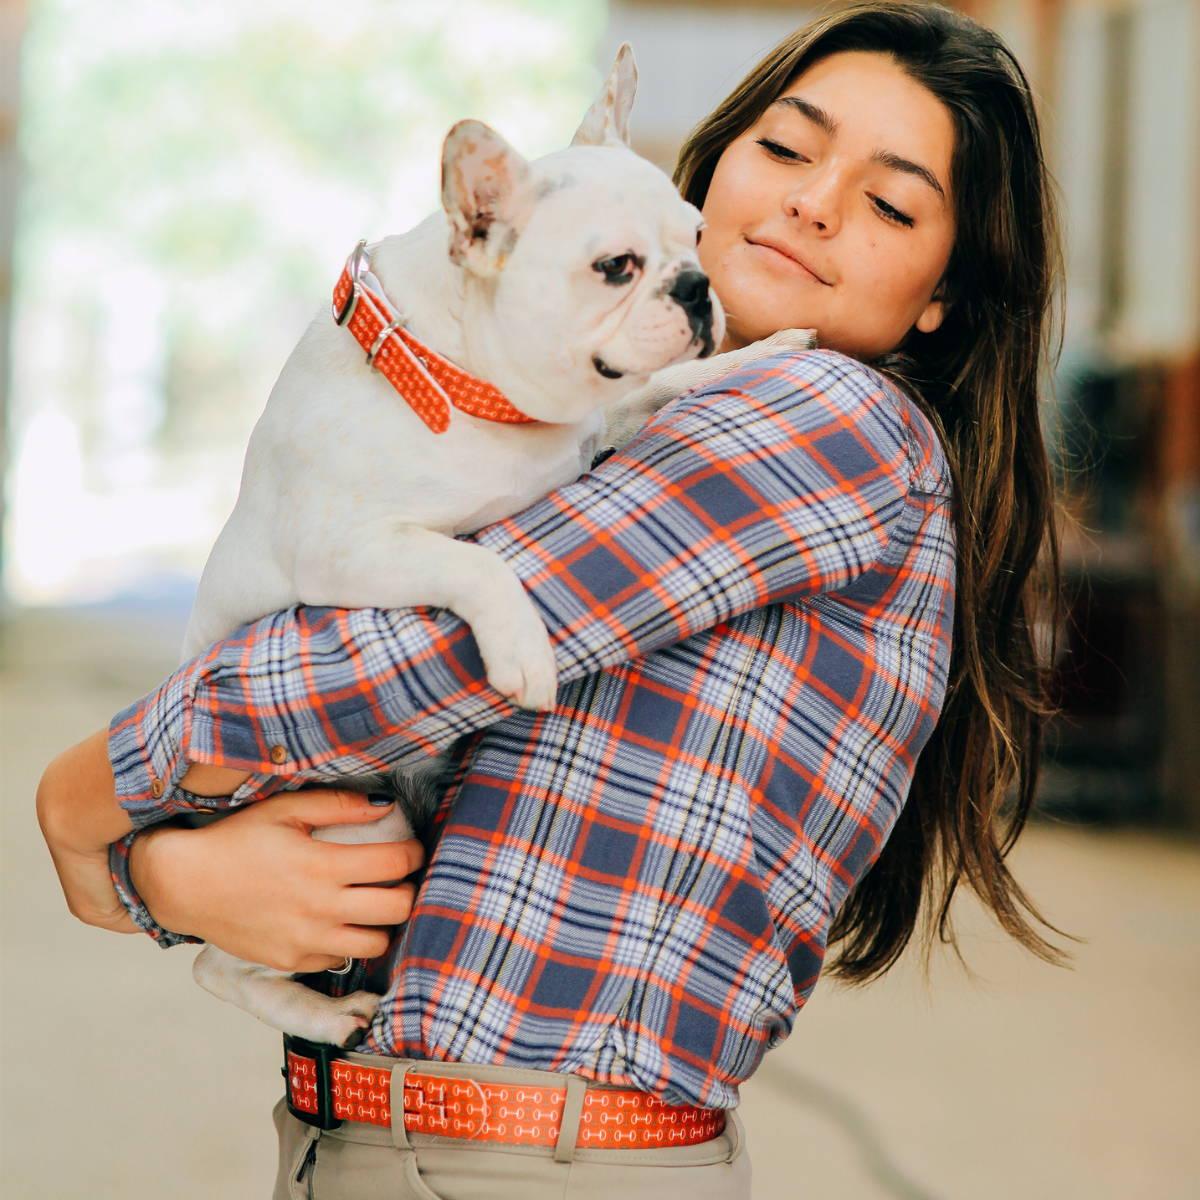 Women holding dog wearing an orange c4 belt